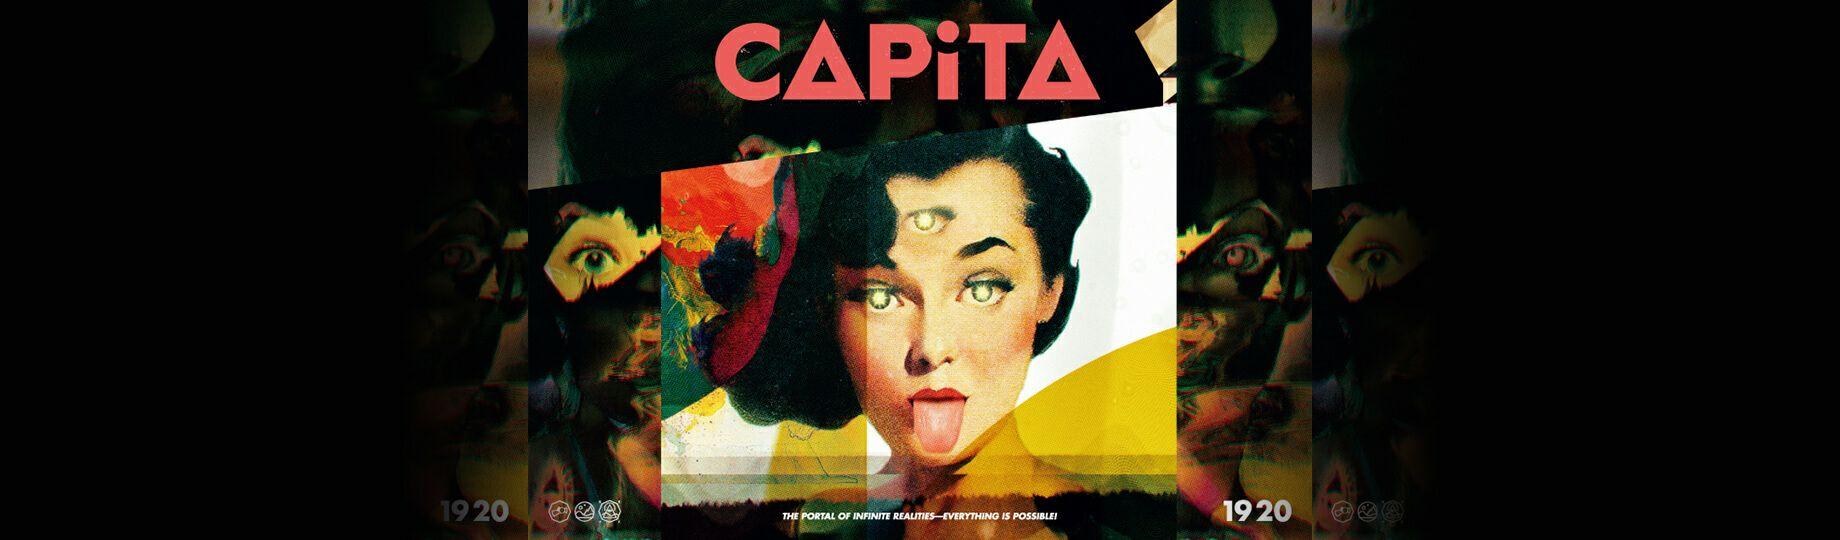 CAPITAメイン画像